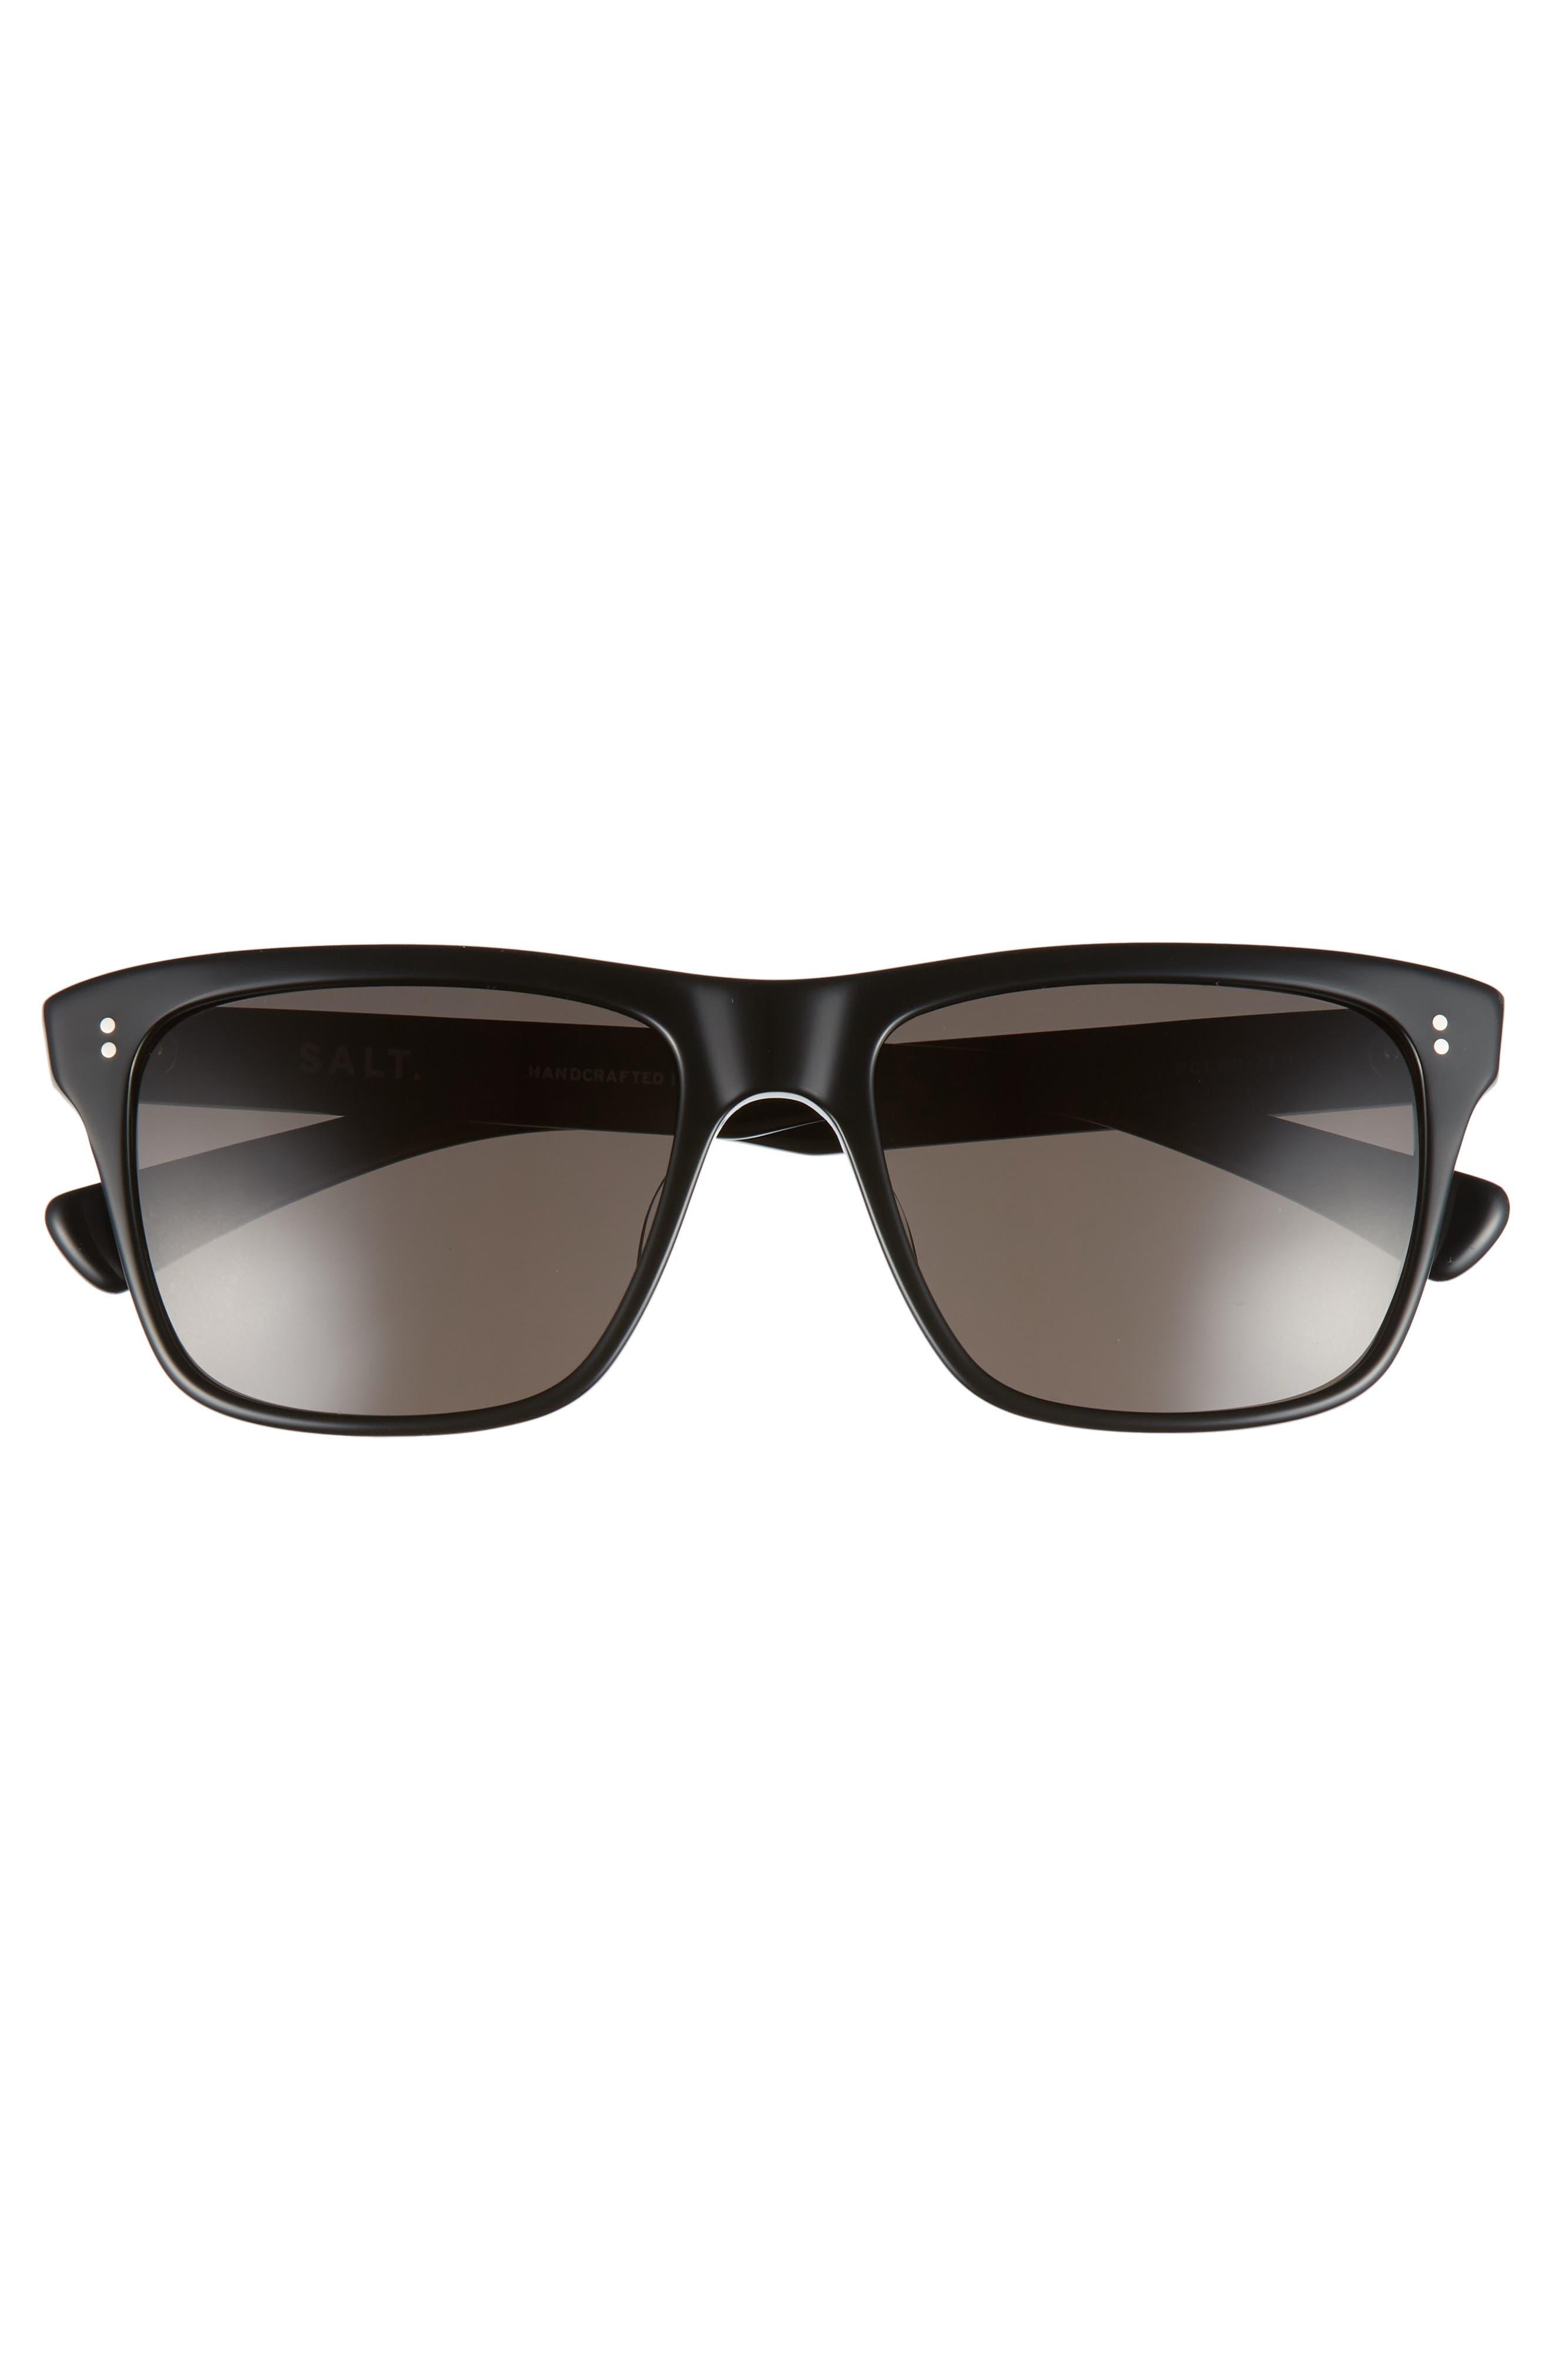 Elihu 57mm Polarized Sunglasses,                             Alternate thumbnail 2, color,                             BLACK